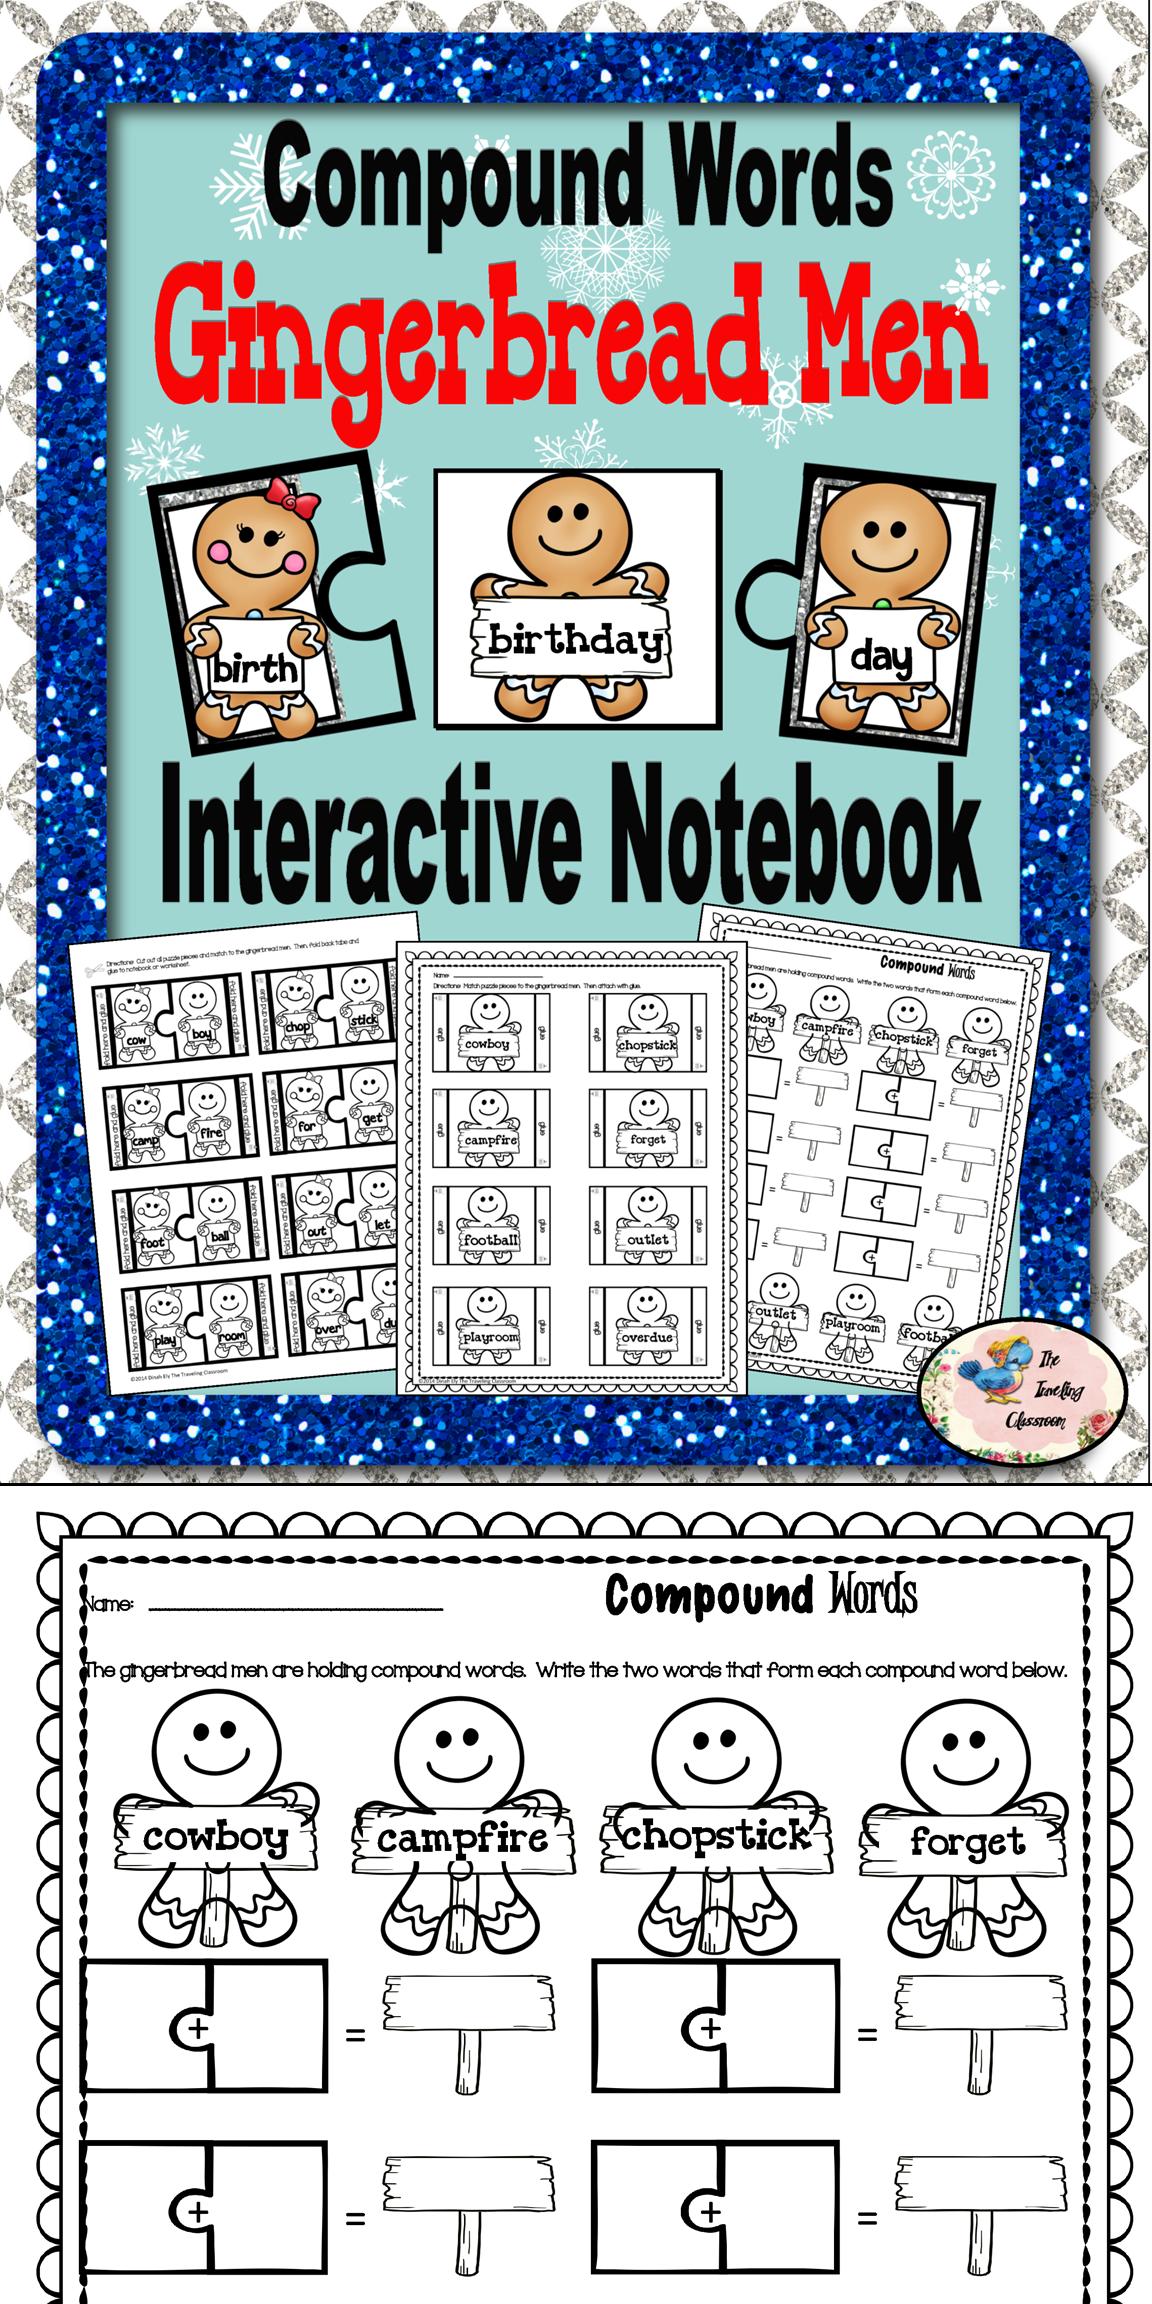 Christmas Compound Words Words Interactive Notebook Activities [ 2304 x 1152 Pixel ]